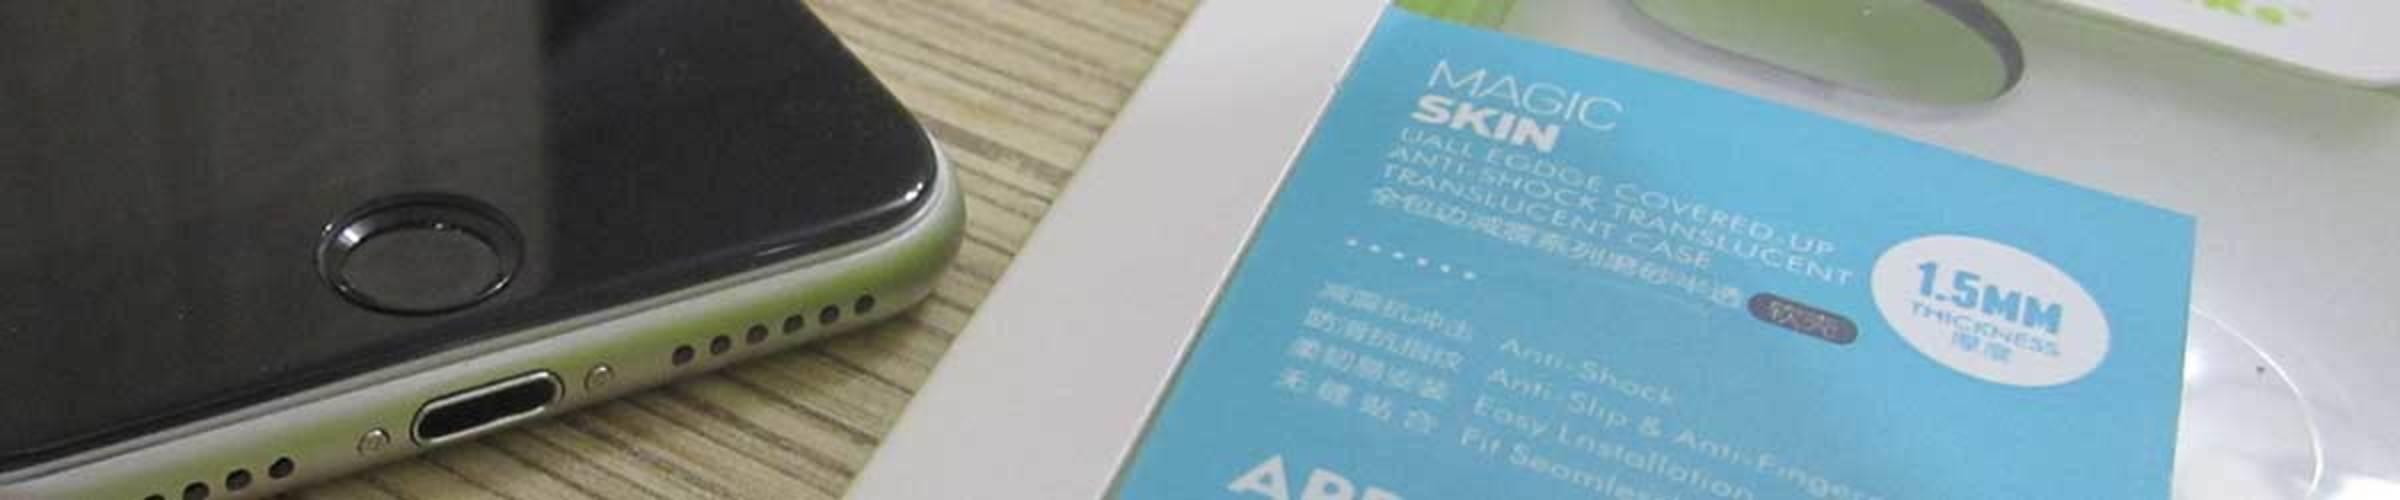 Обзор чехла серии Skin для iPhone 7/8 и 7Plus/8Plus